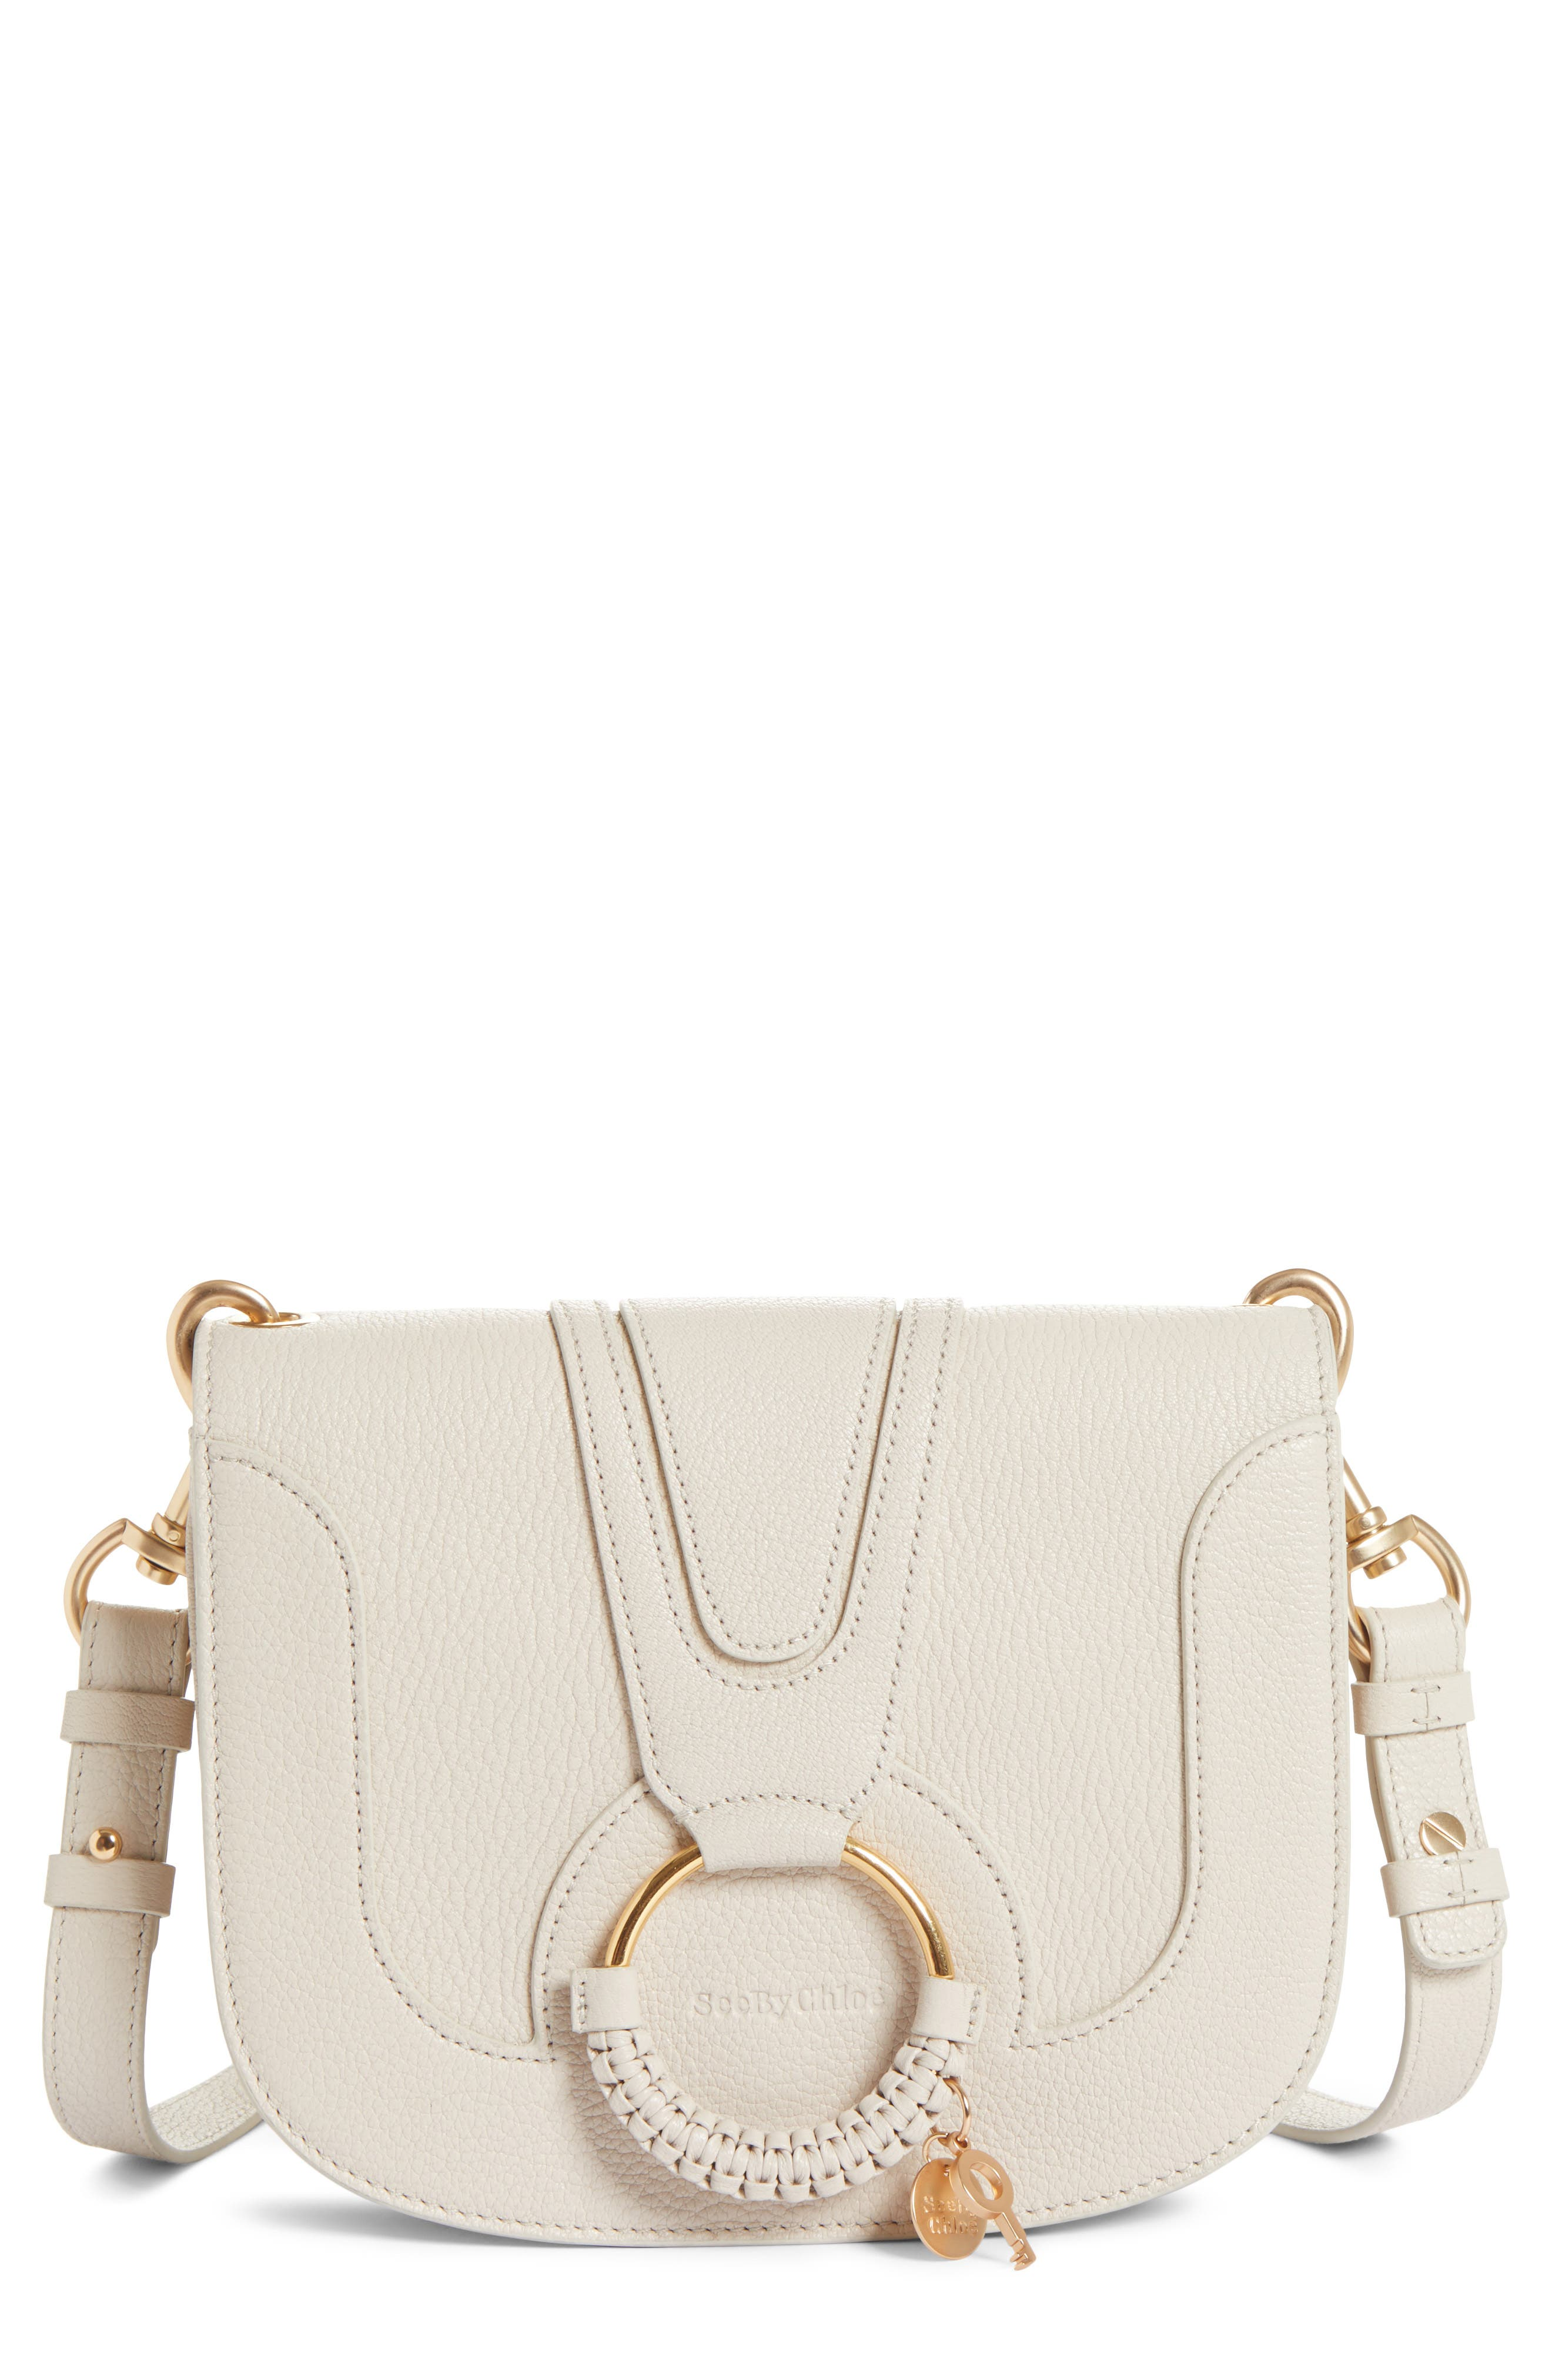 Hana Small Leather Crossbody Bag,                             Main thumbnail 4, color,